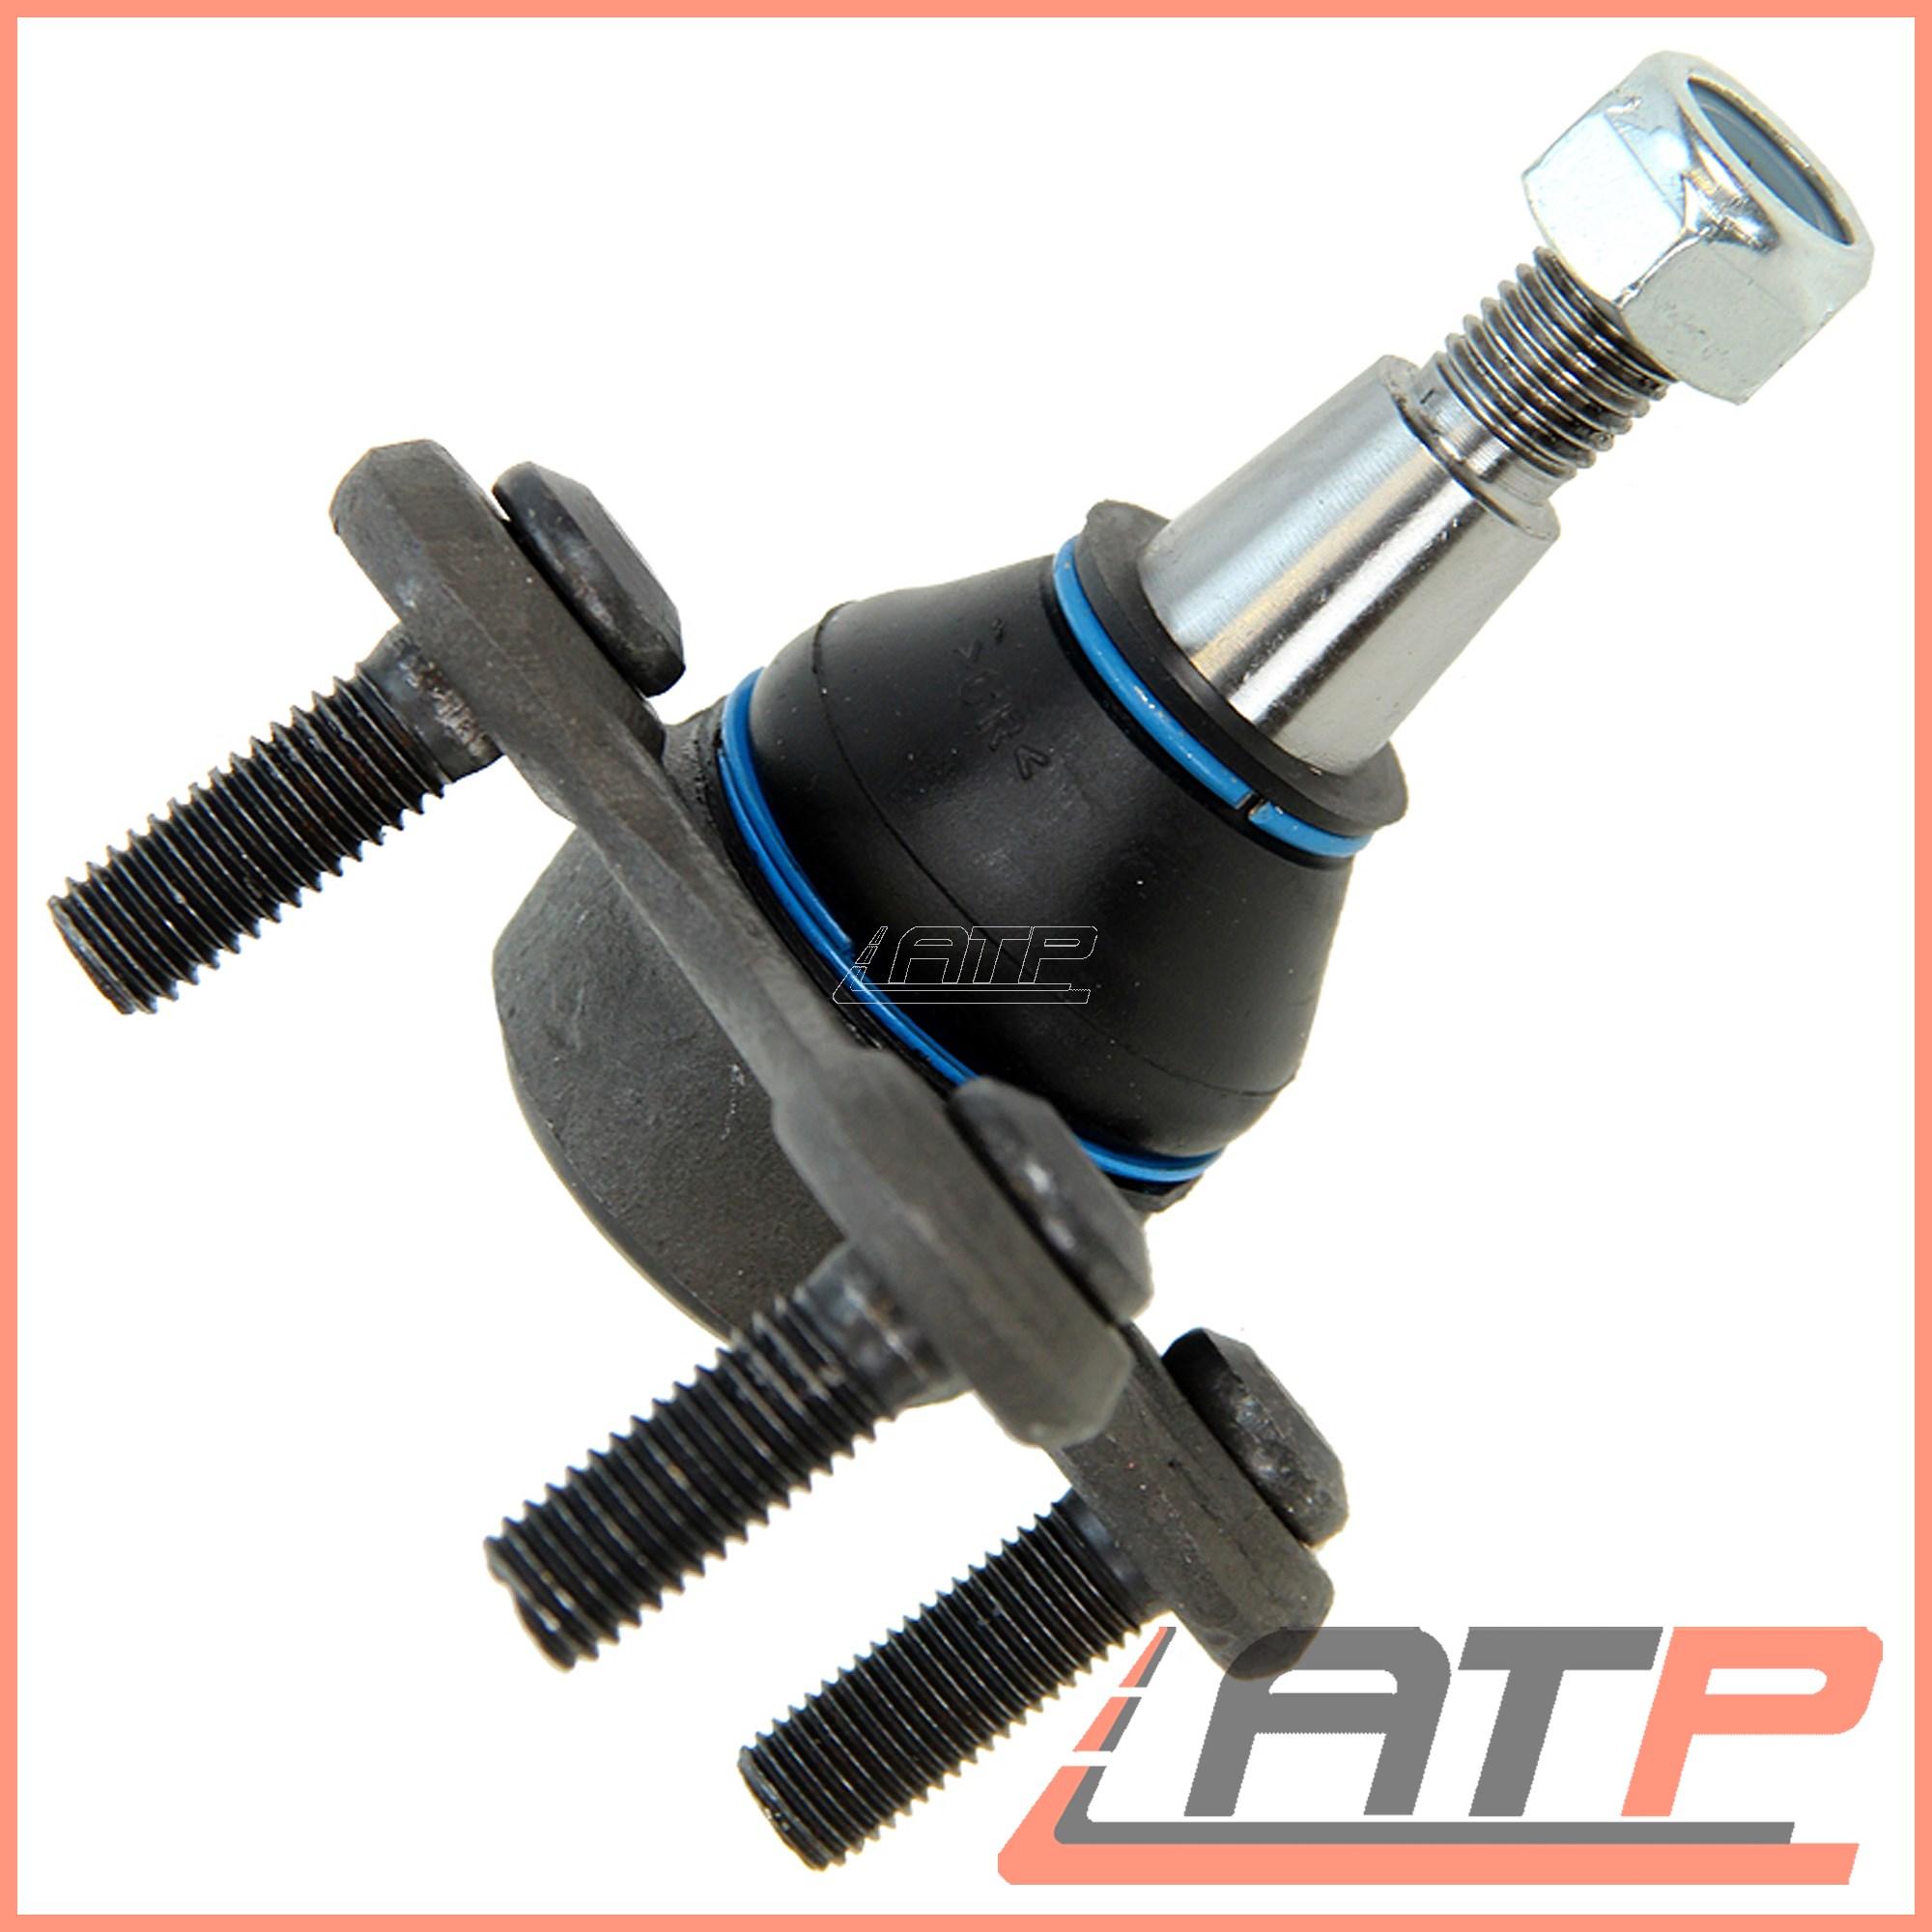 SUSPENSION CONTROL ARM WISHBONE KIT FRONT VW PASSAT CC 08-12 3C SHARAN 7N